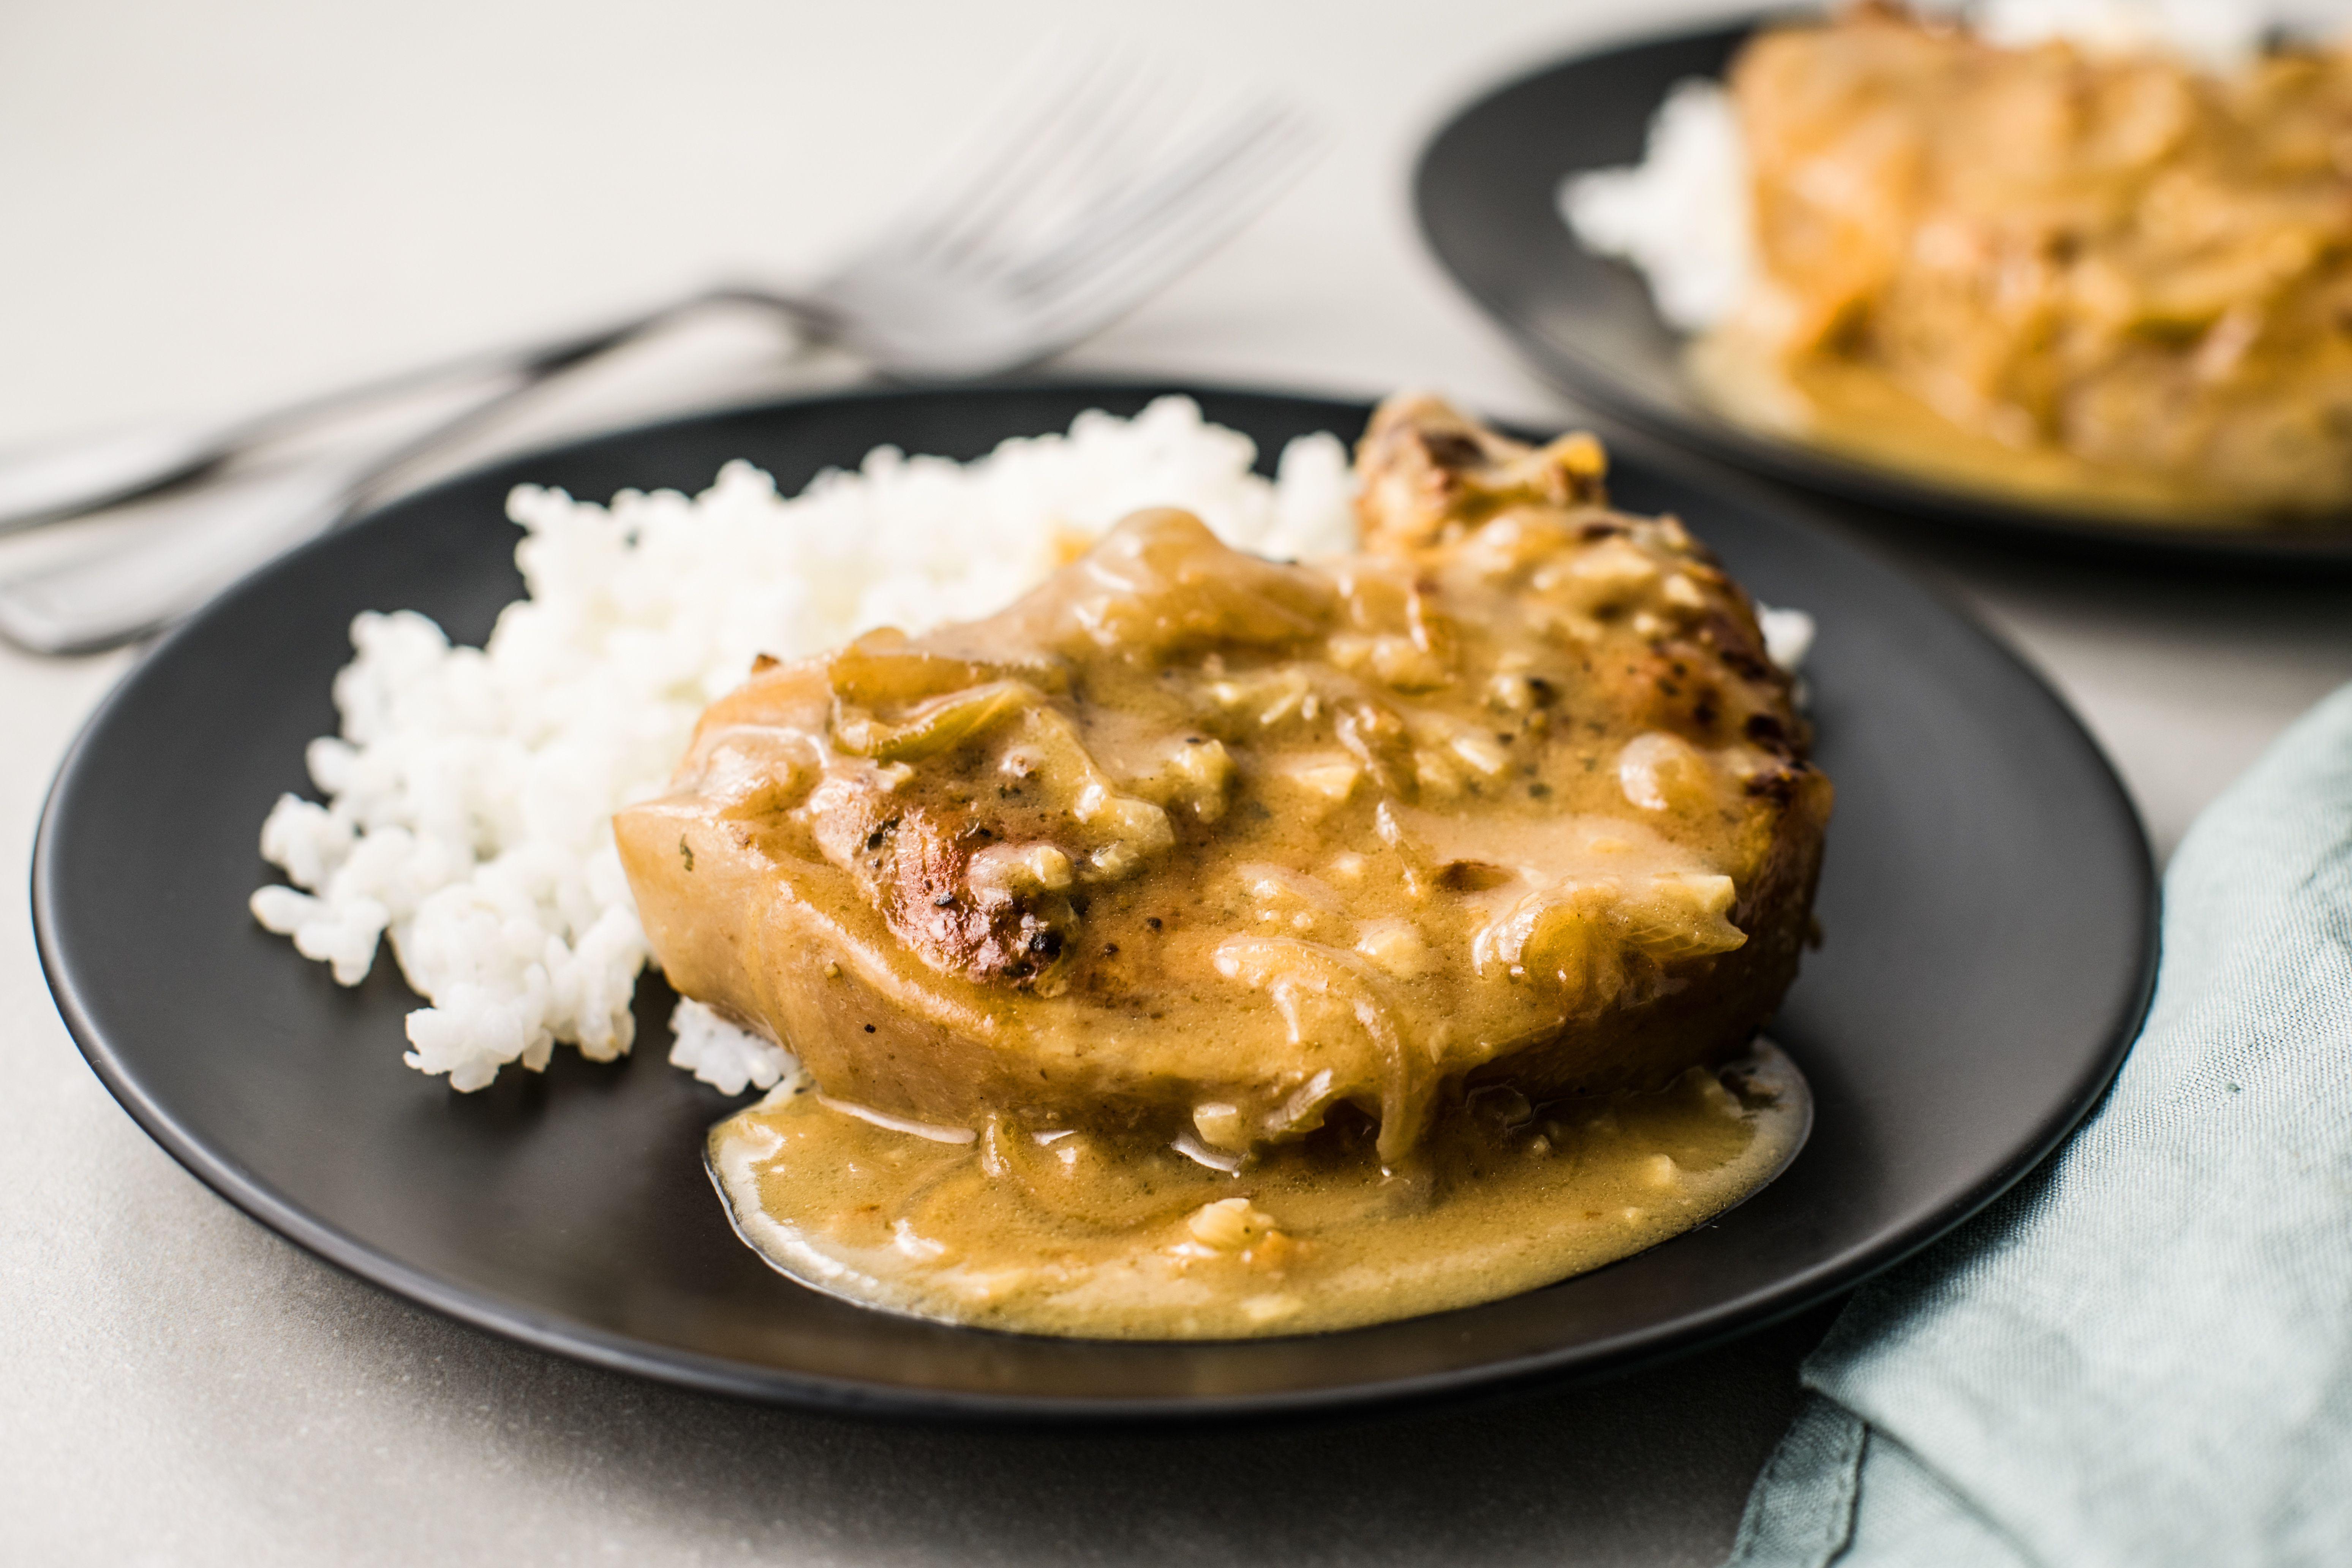 Serve over white rice